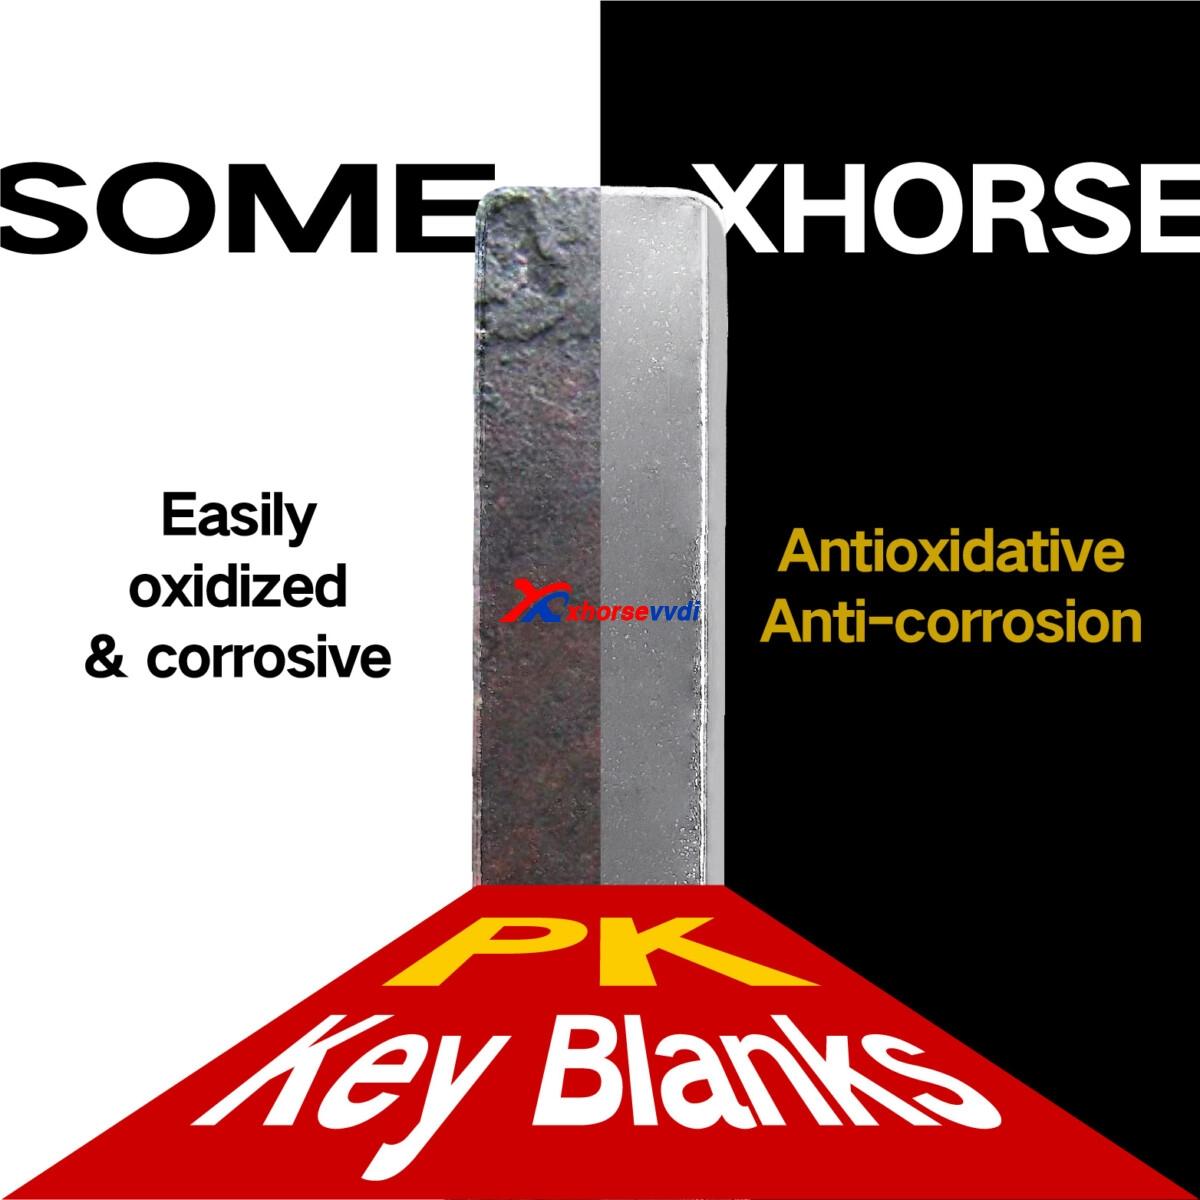 xhorse-universal-key-blank-03